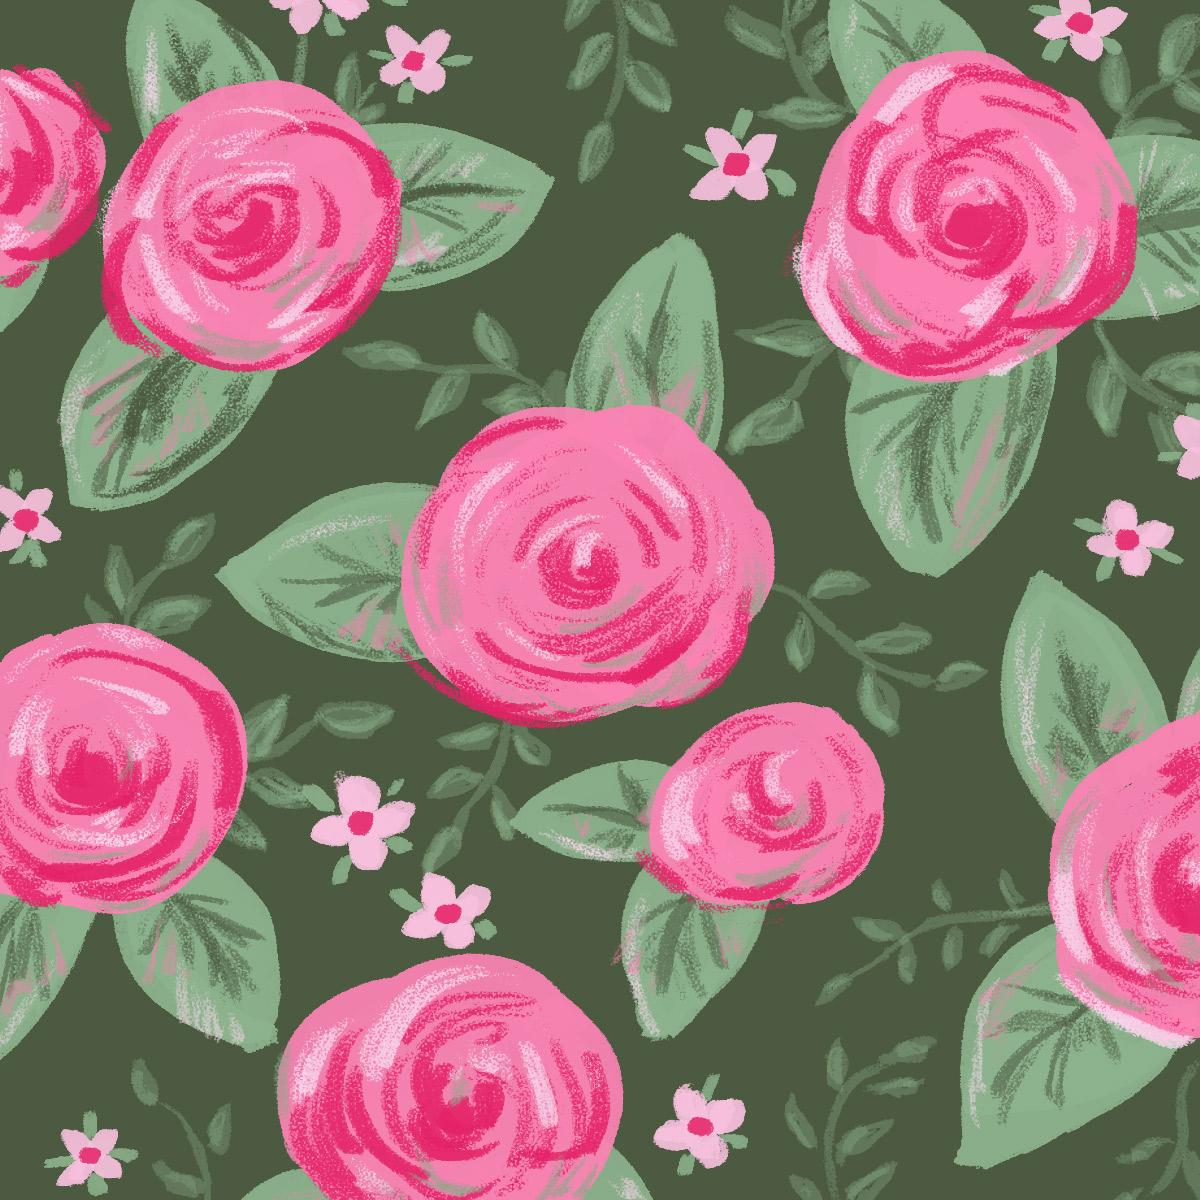 2018-02_FloralPatterns_01.jpg